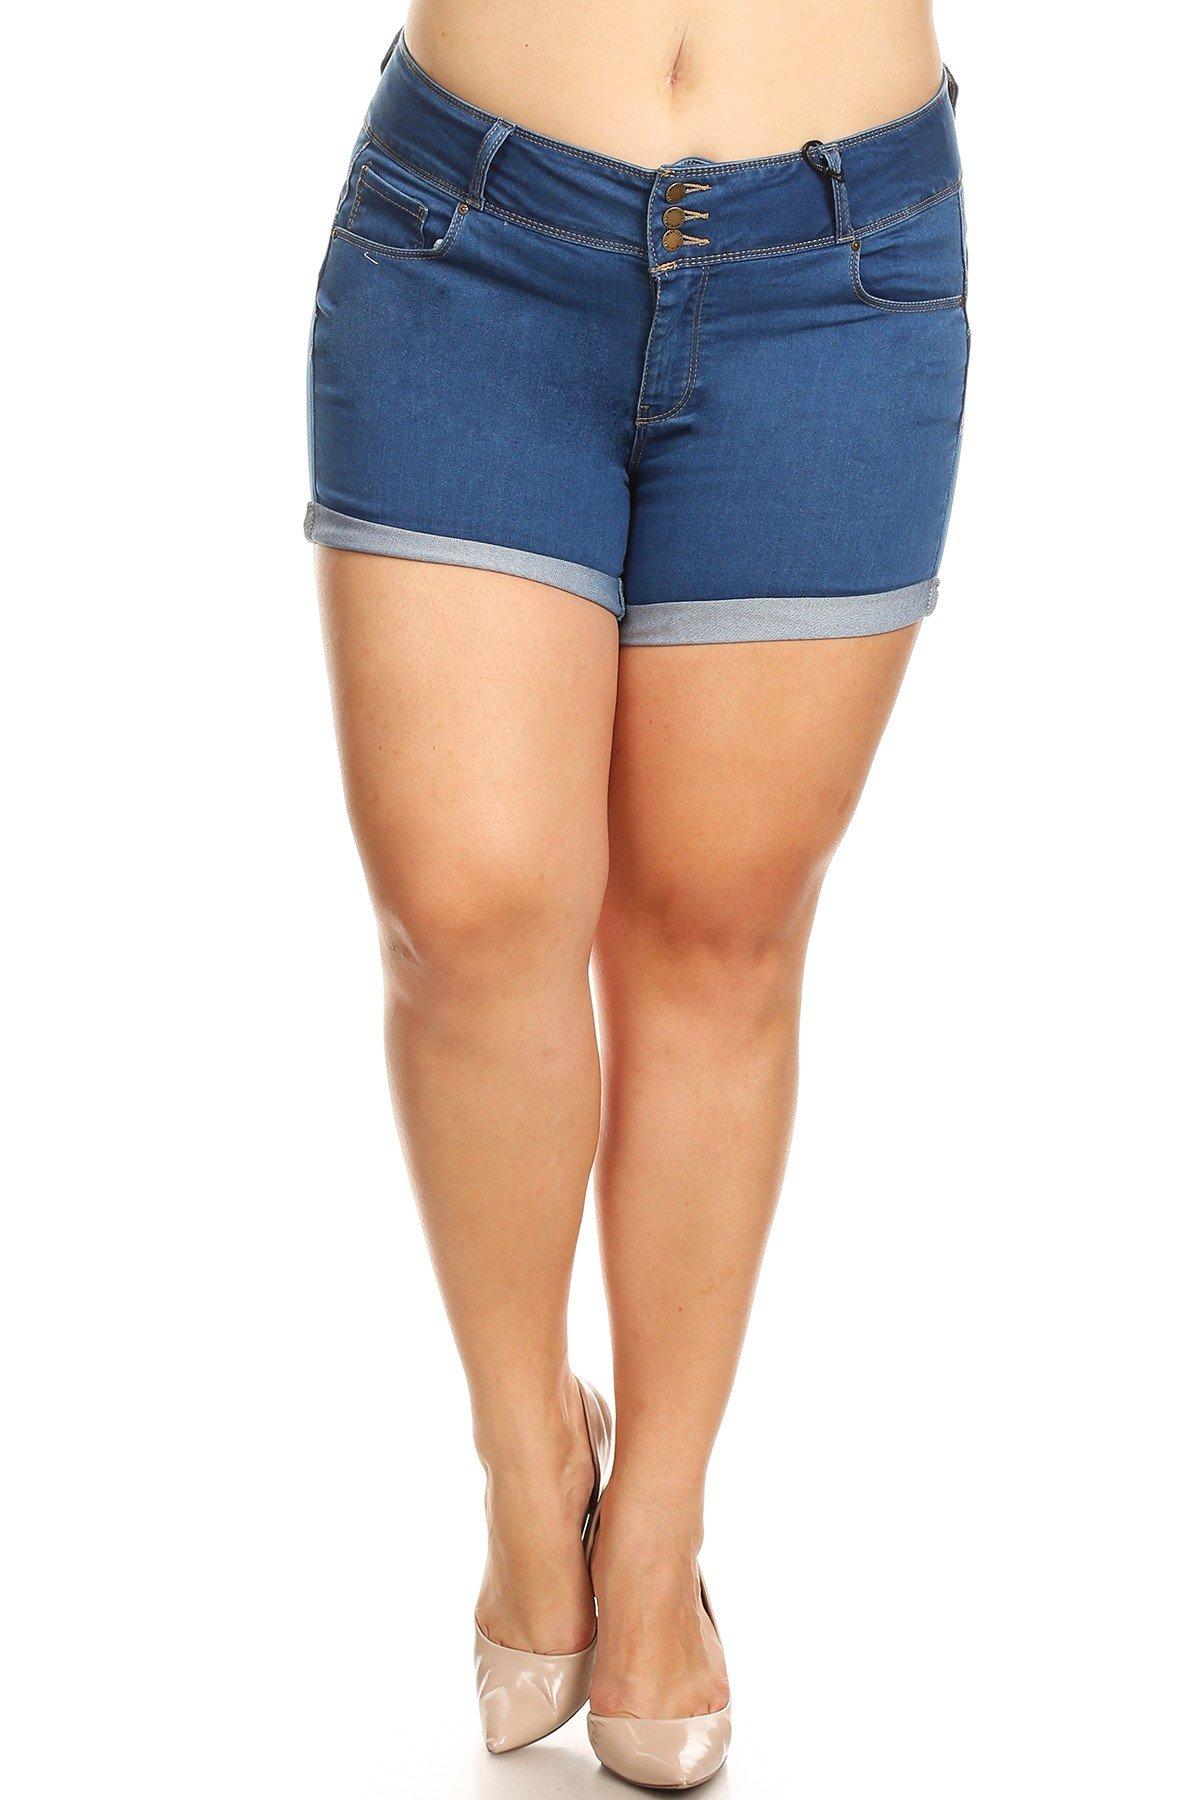 Women's Plus Size 3 Button High Waist Denim Jean Shorts (3XL, Medium)